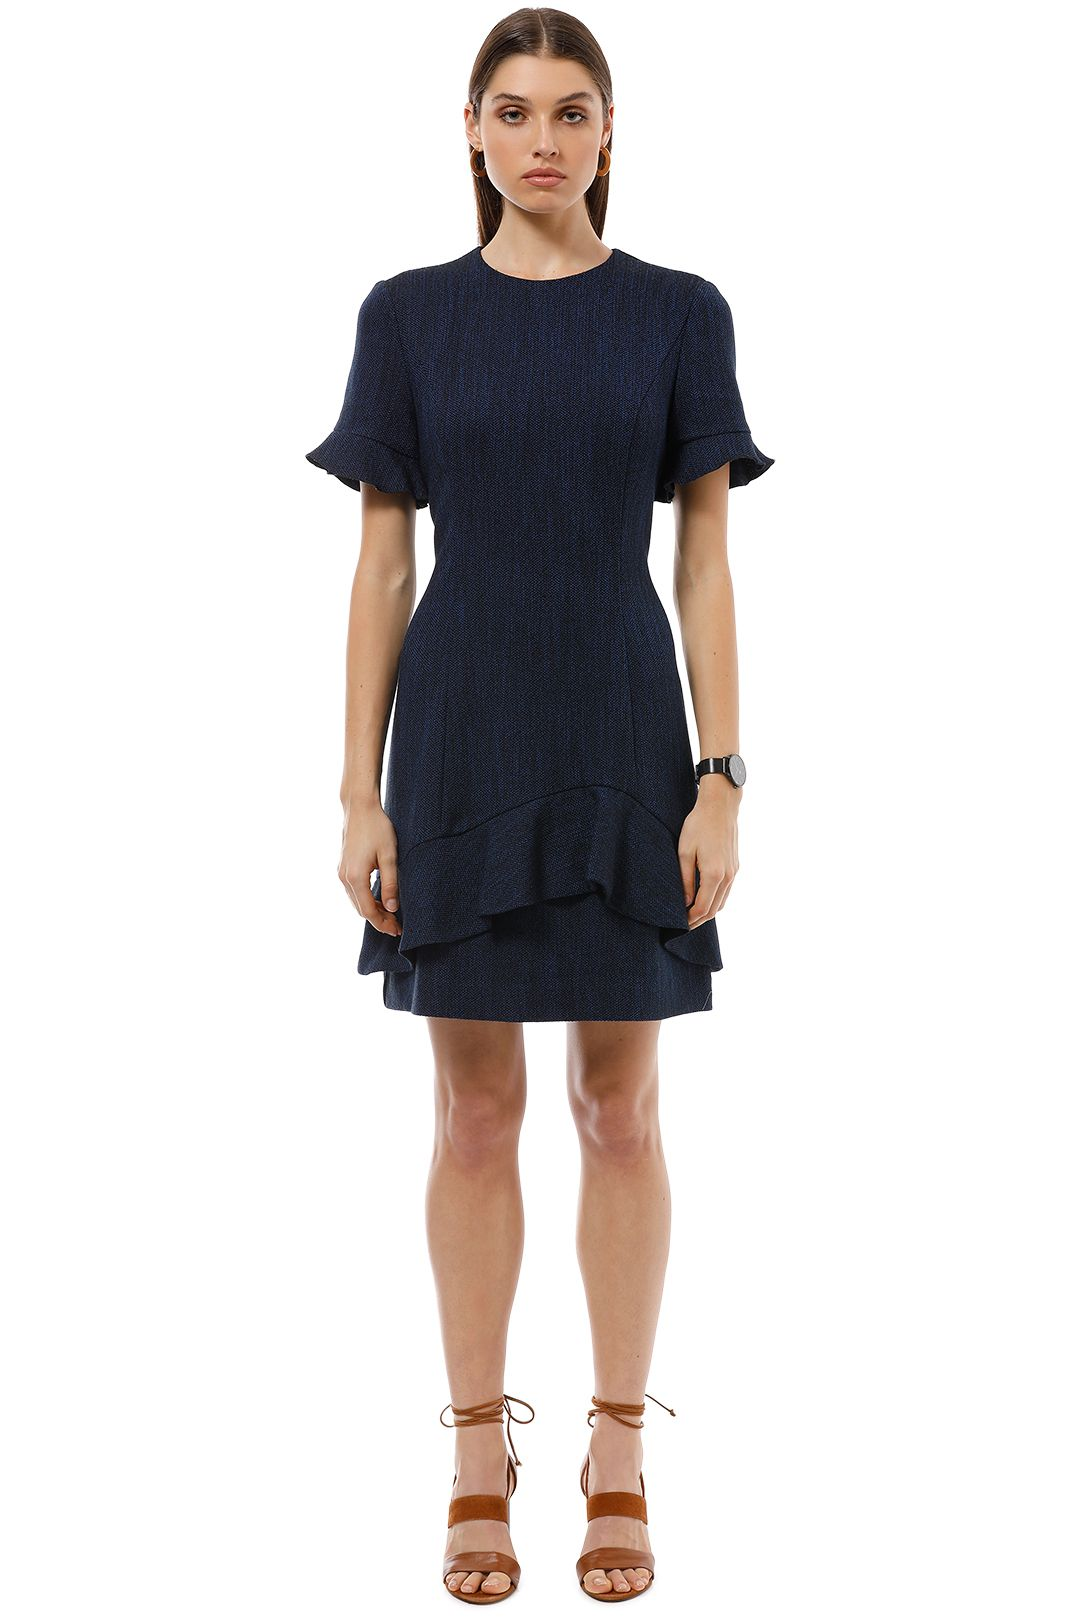 Cue - Tweed Asymmetric Frill Dress - Blue - Front